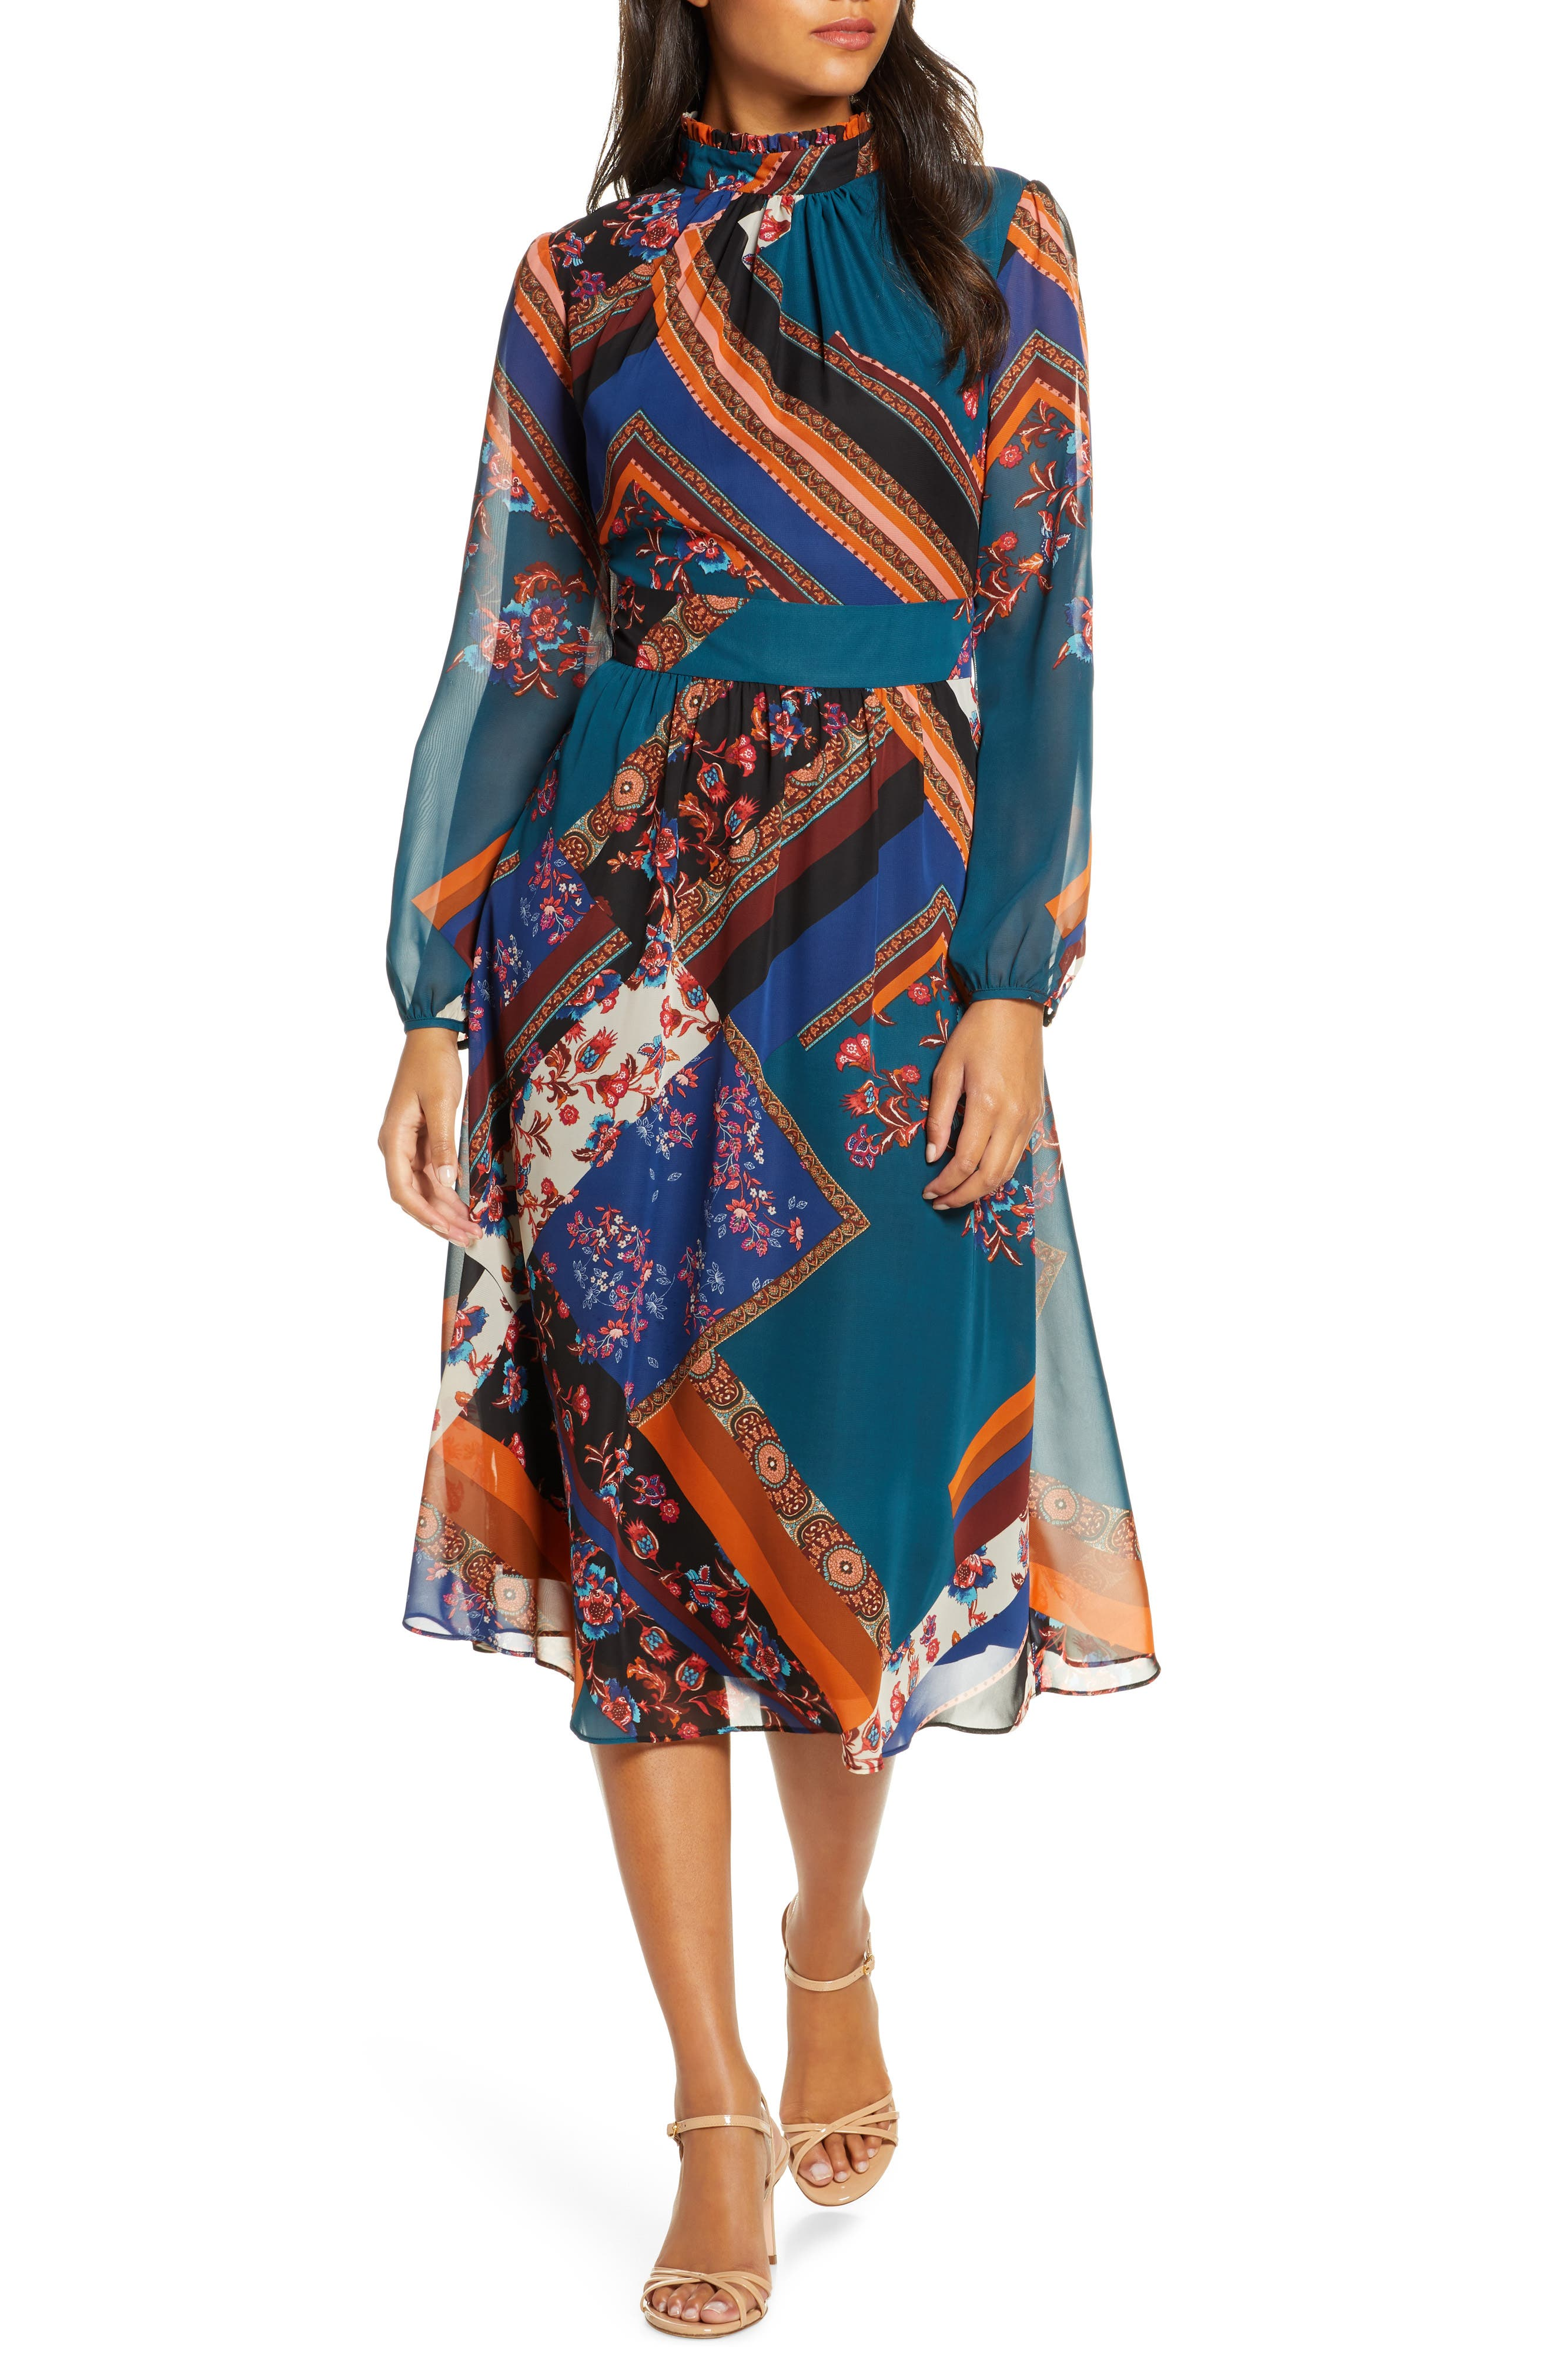 60s Dresses | 1960s Dresses Mod, Mini, Hippie Womens Julia Jordan Mock Neck Long Sleeve Fit  Flare Dress $118.00 AT vintagedancer.com